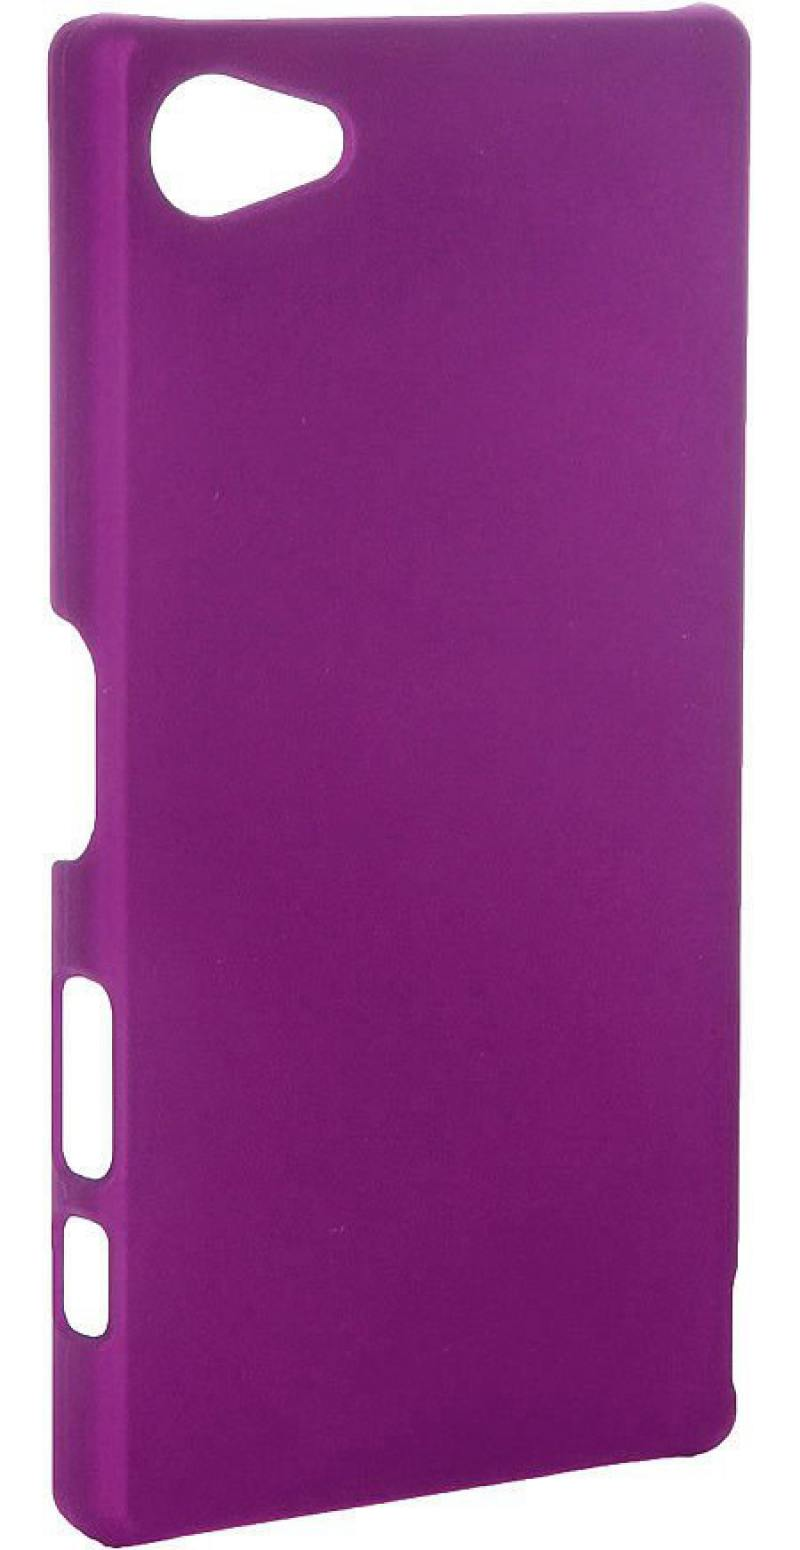 Чехол-накладка для Sony Z5 Compact Pulsar CLIPCASE PC Soft-Touch РСС0140 Purple клип-кейс, пластик цены